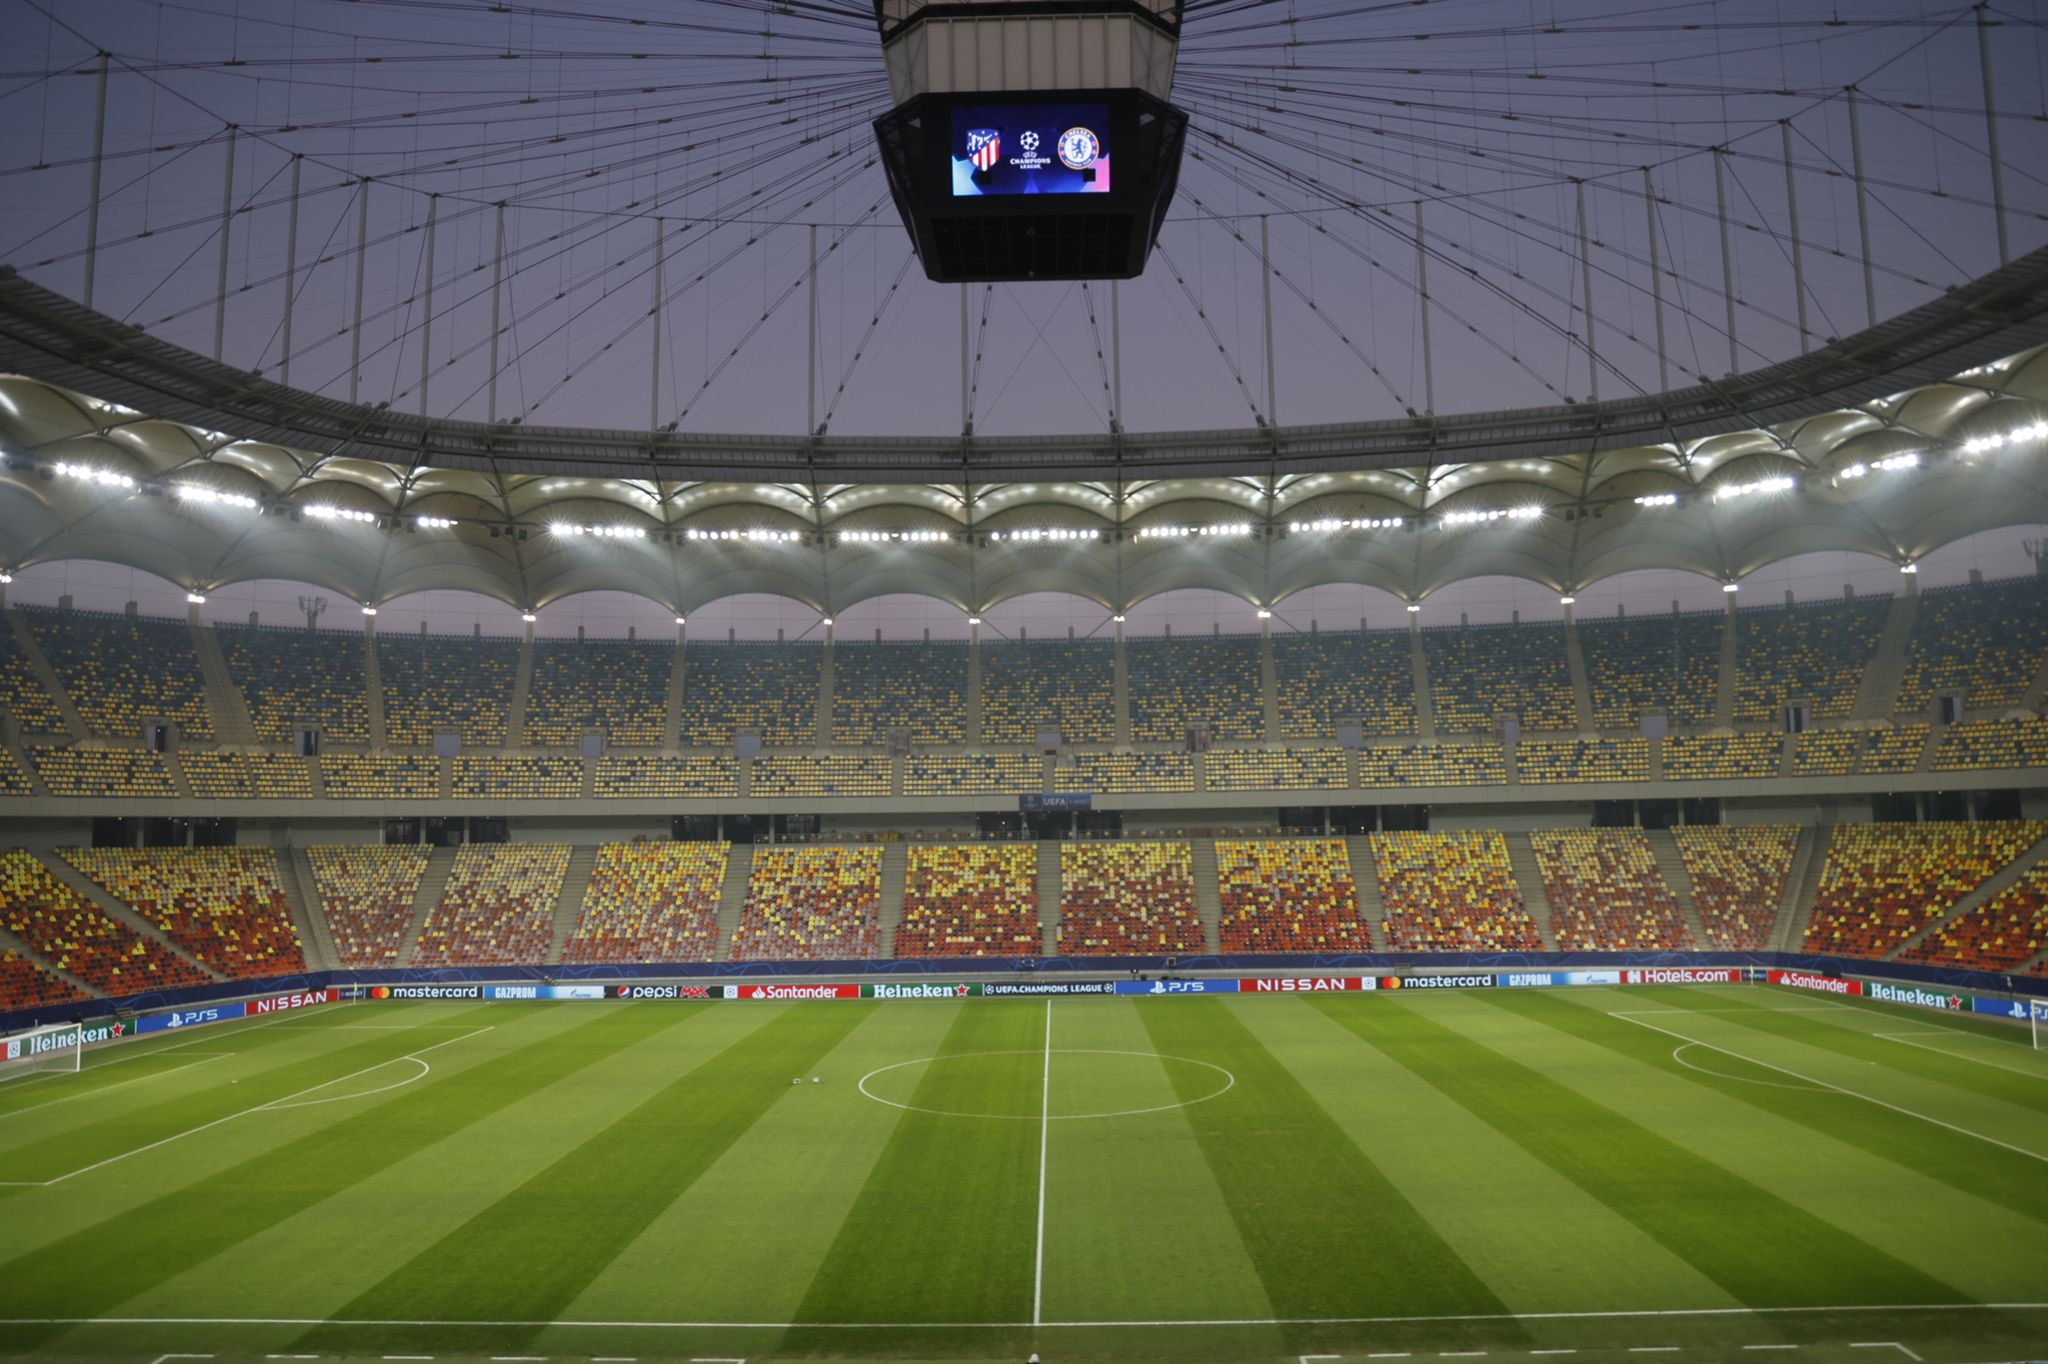 Arena Nationala Atletico Chelsea